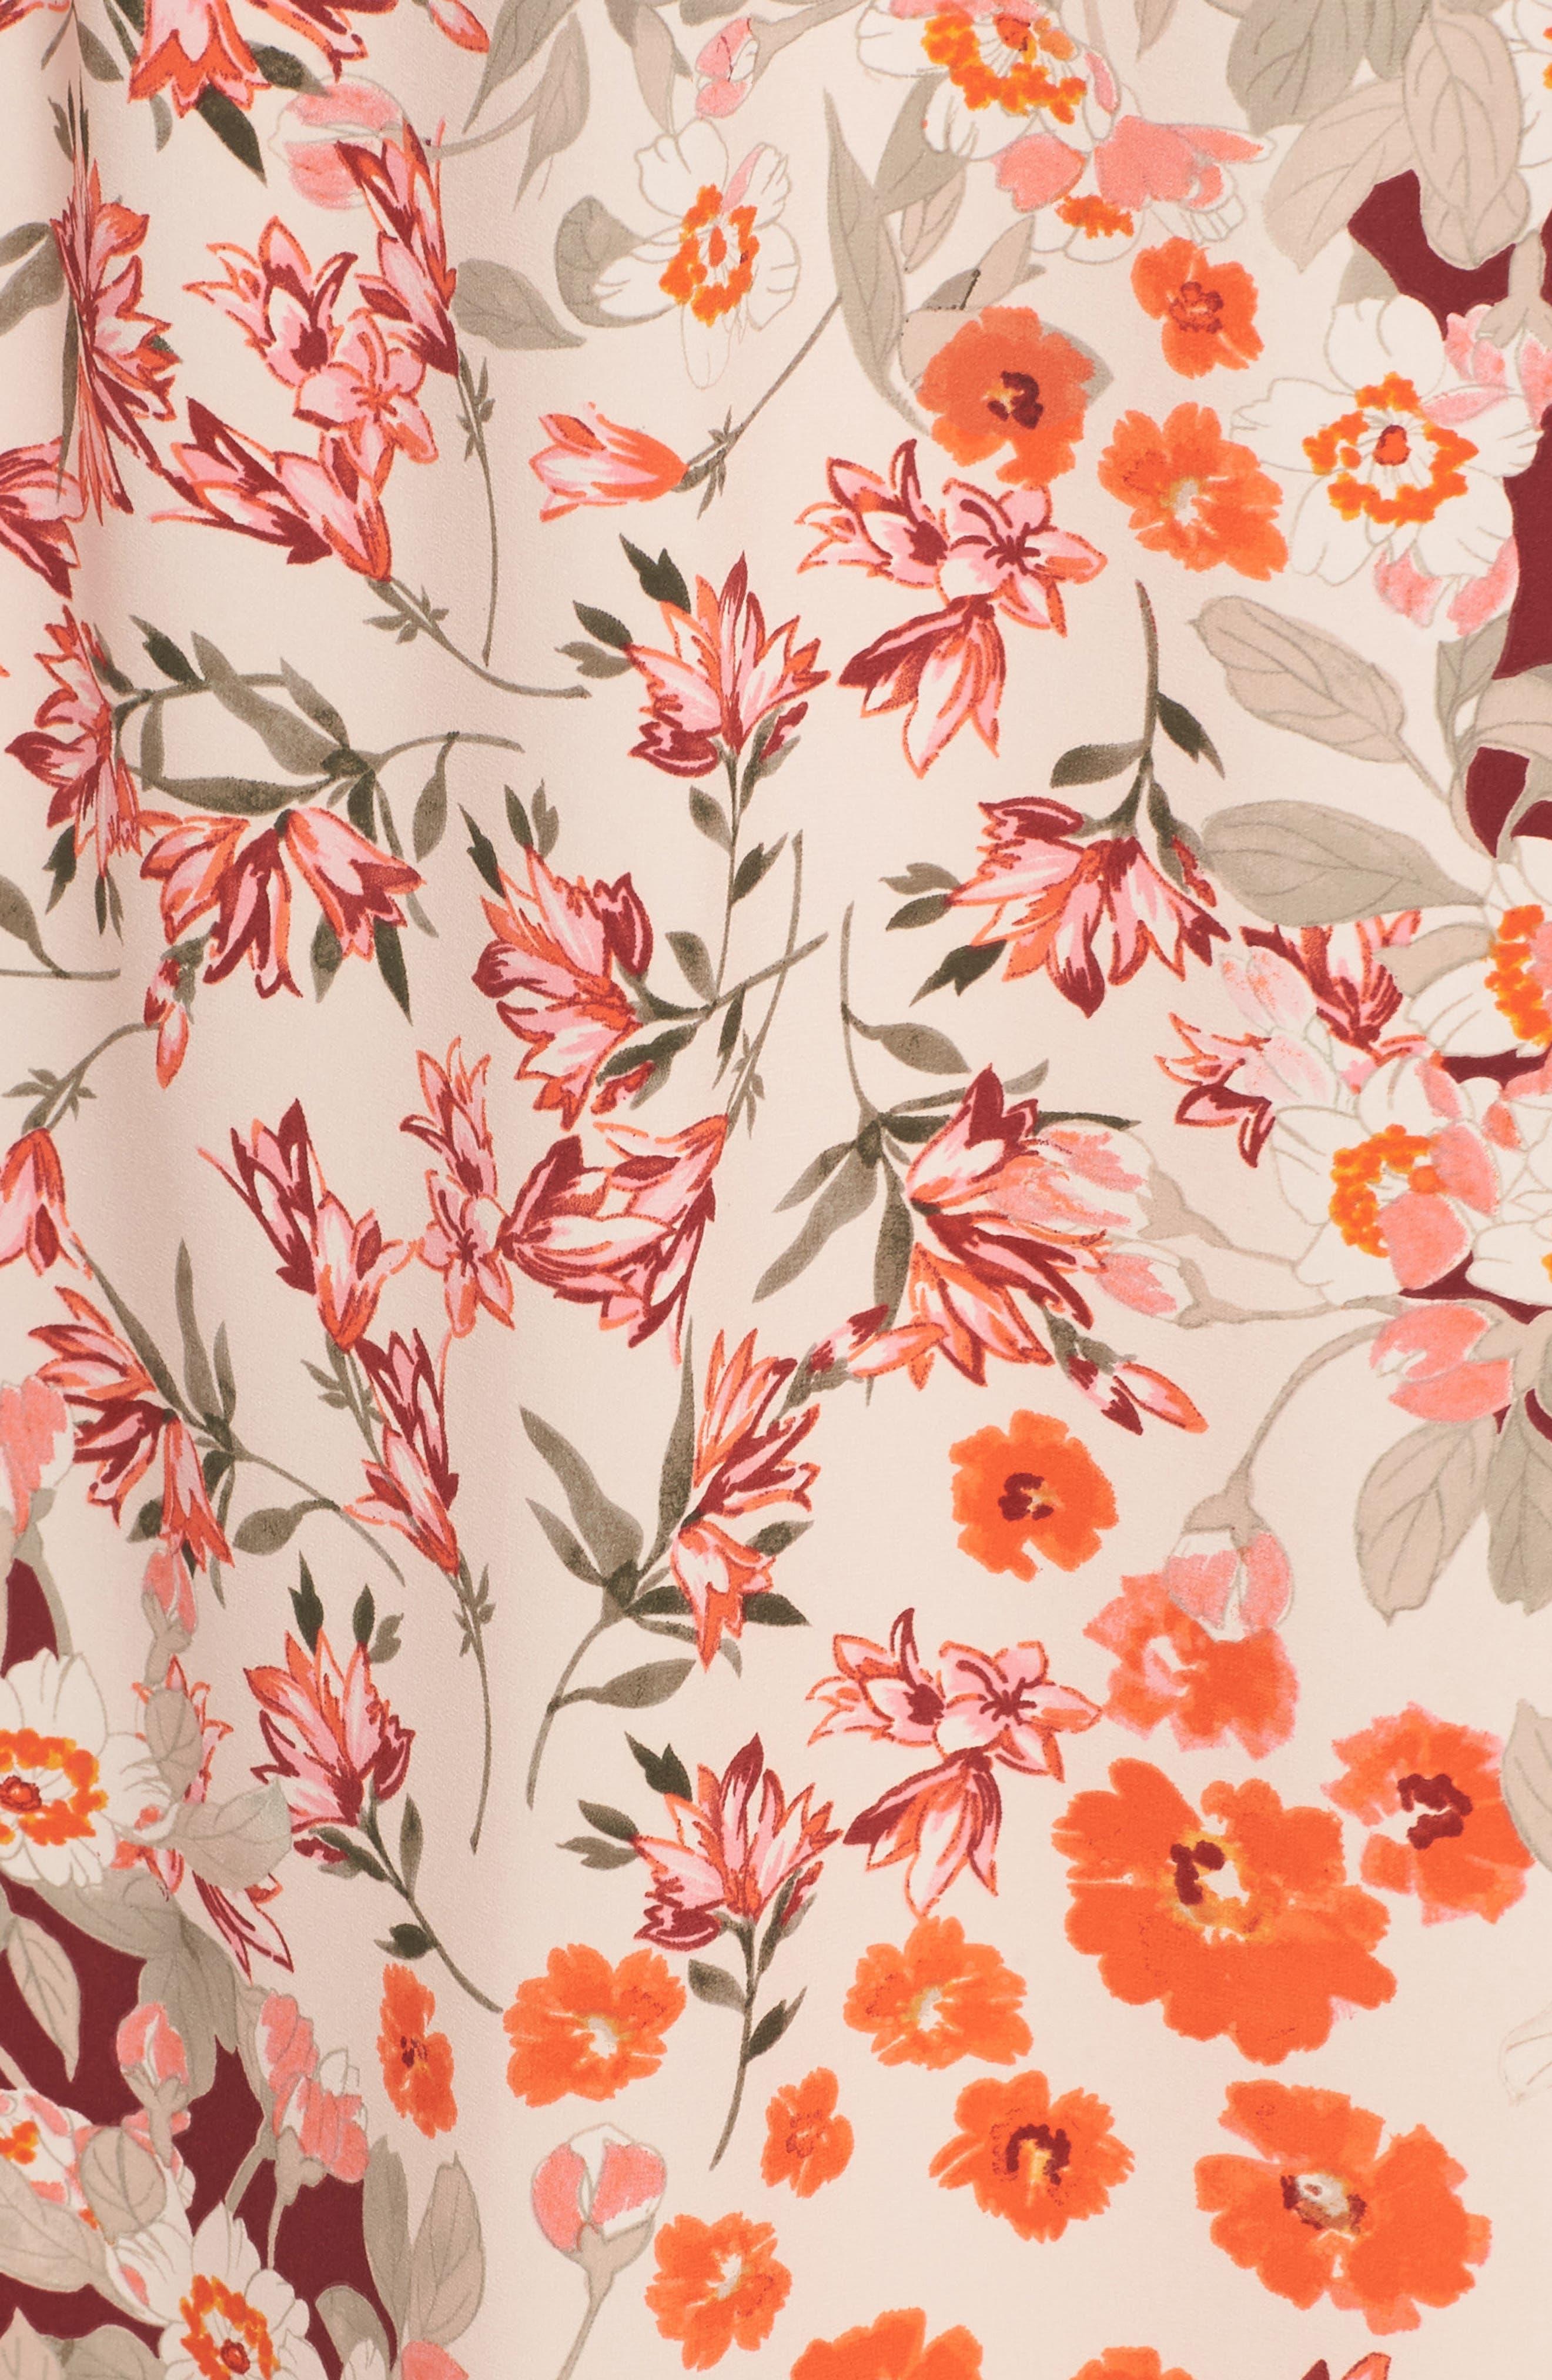 Floral Ruffle Sleeve Maxi Dress,                             Alternate thumbnail 6, color,                             Geranium Multi